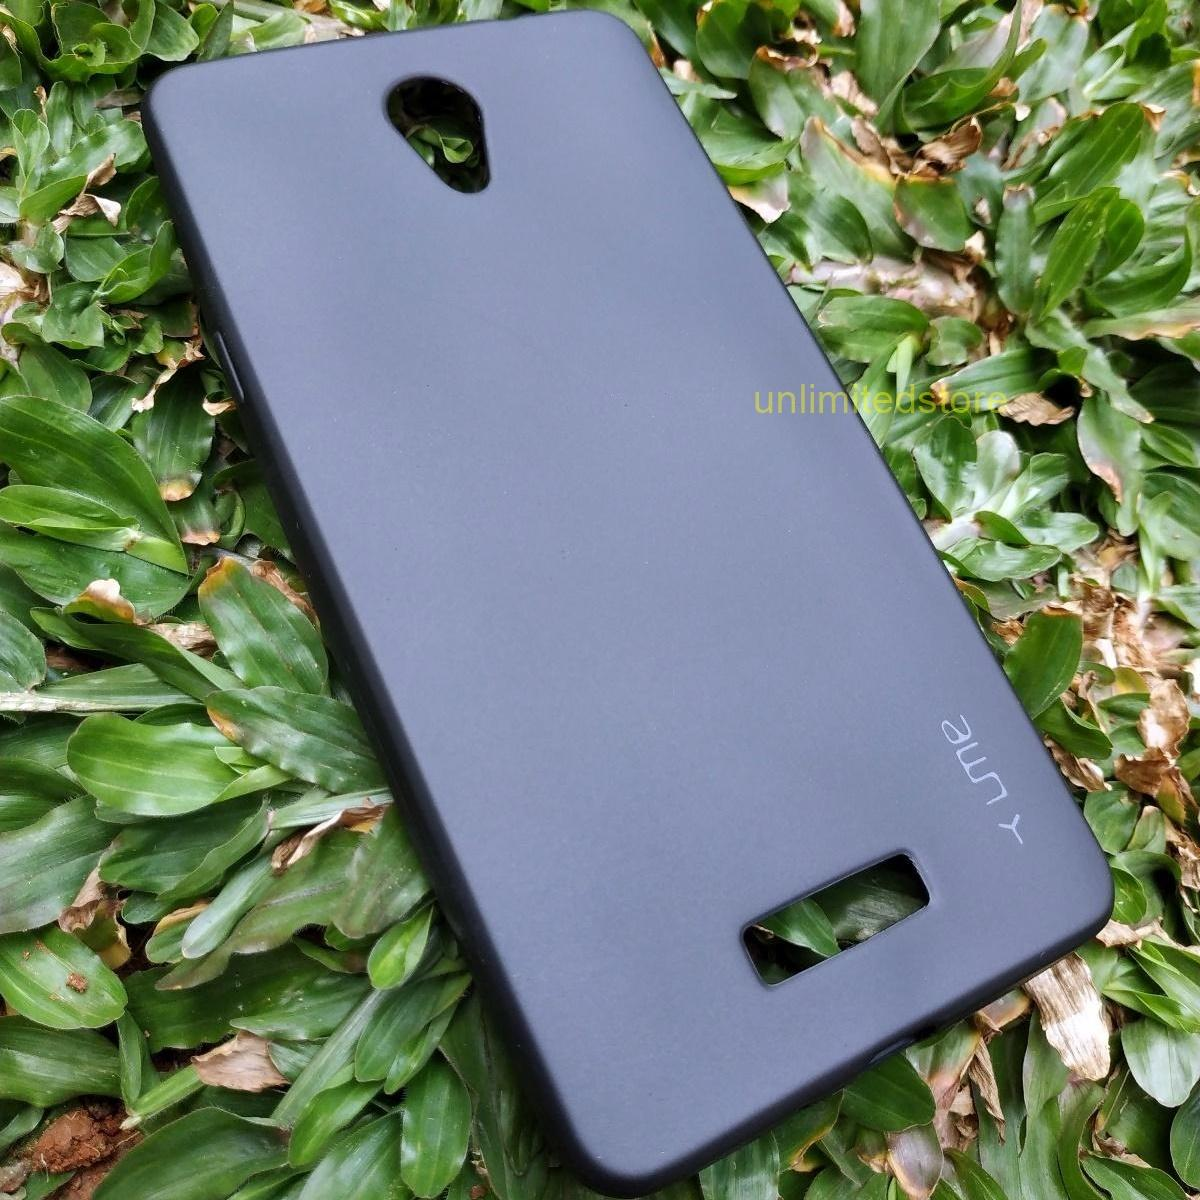 Jual Silicone Case Soft Murah Garansi Dan Berkualitas Id Store Softcase Covet Blackberry Aurora Bb Silikon Silicon Ume Eco For 360 Protection Auroraidr34700 Rp 35000